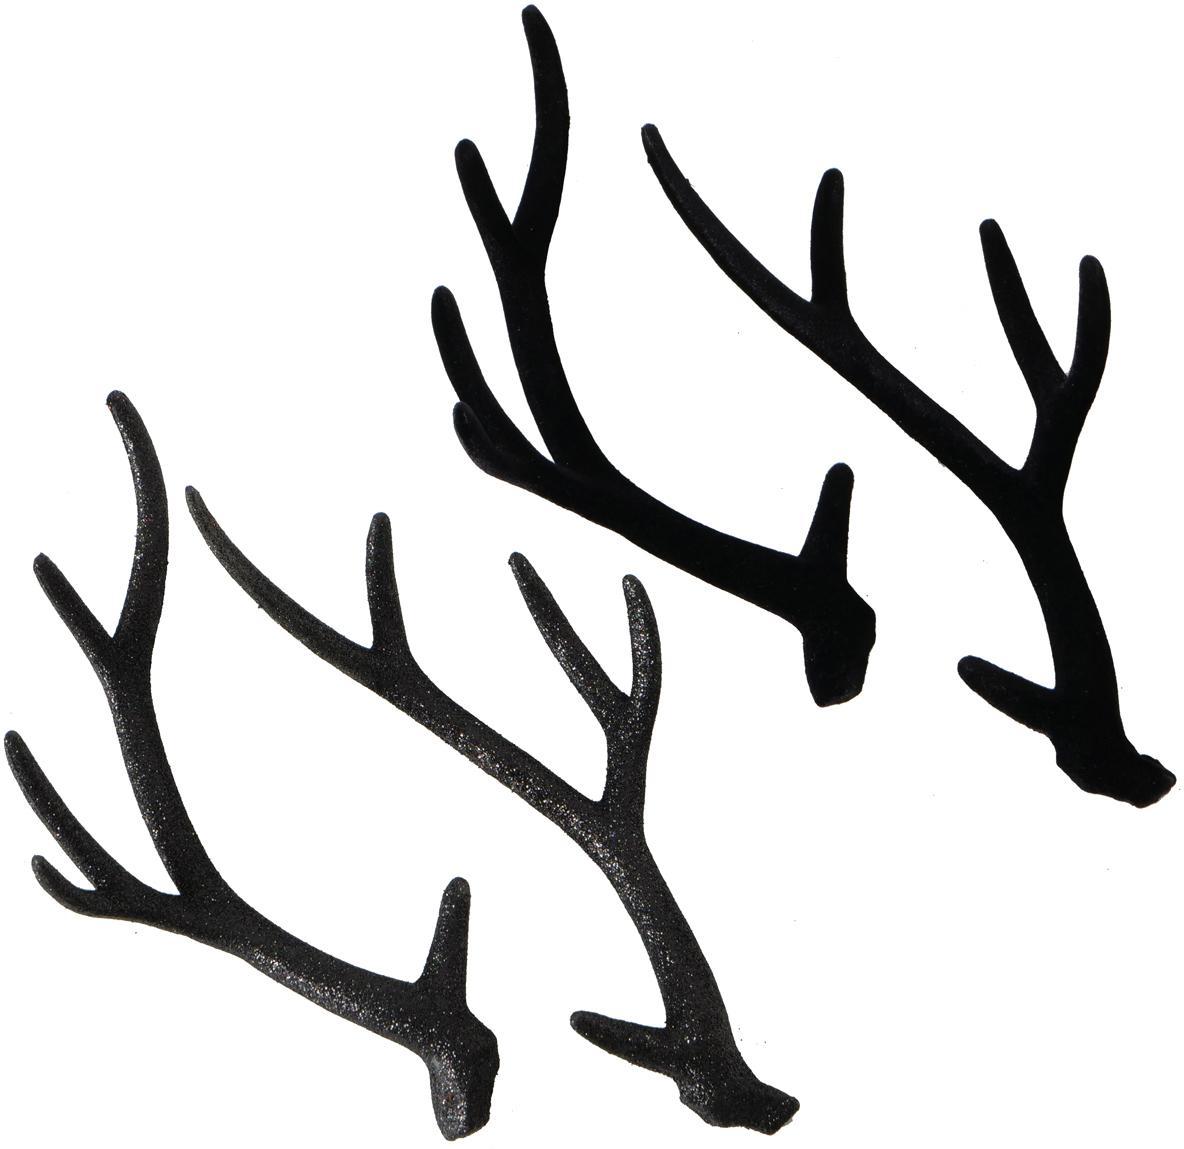 Set de piezas decorativas Crany, 2pzas., Plástico, Negro, An 16 x Al 30 cm